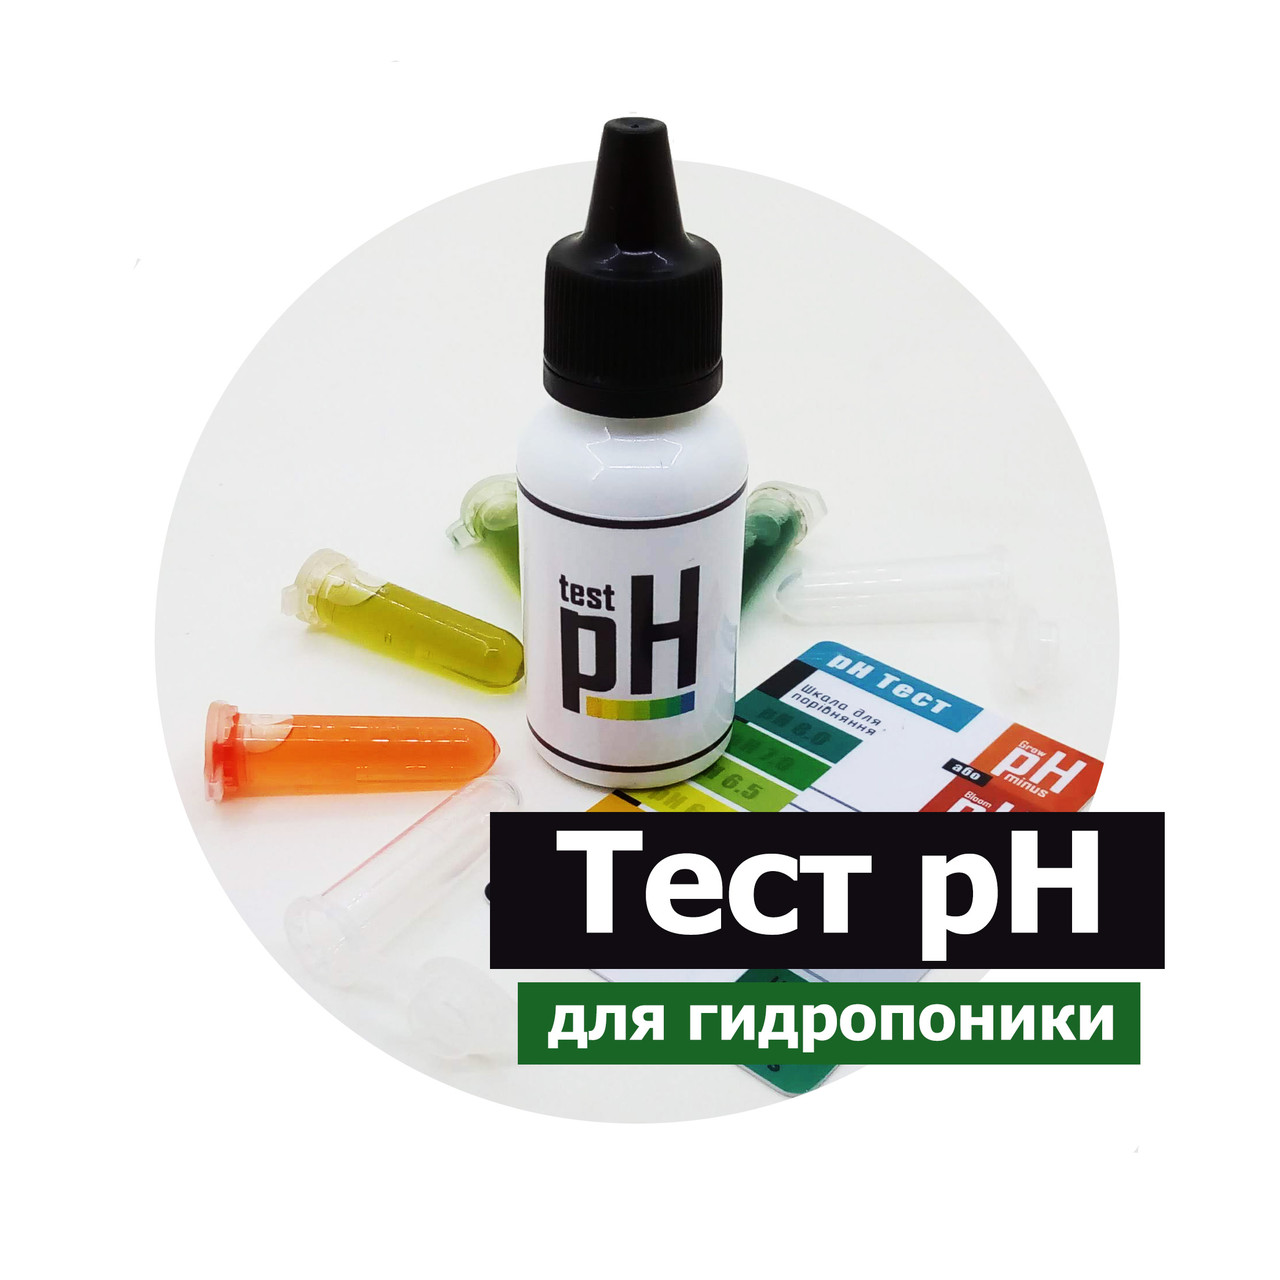 Тест pH жидкий от FloraGrowing на 500 проб